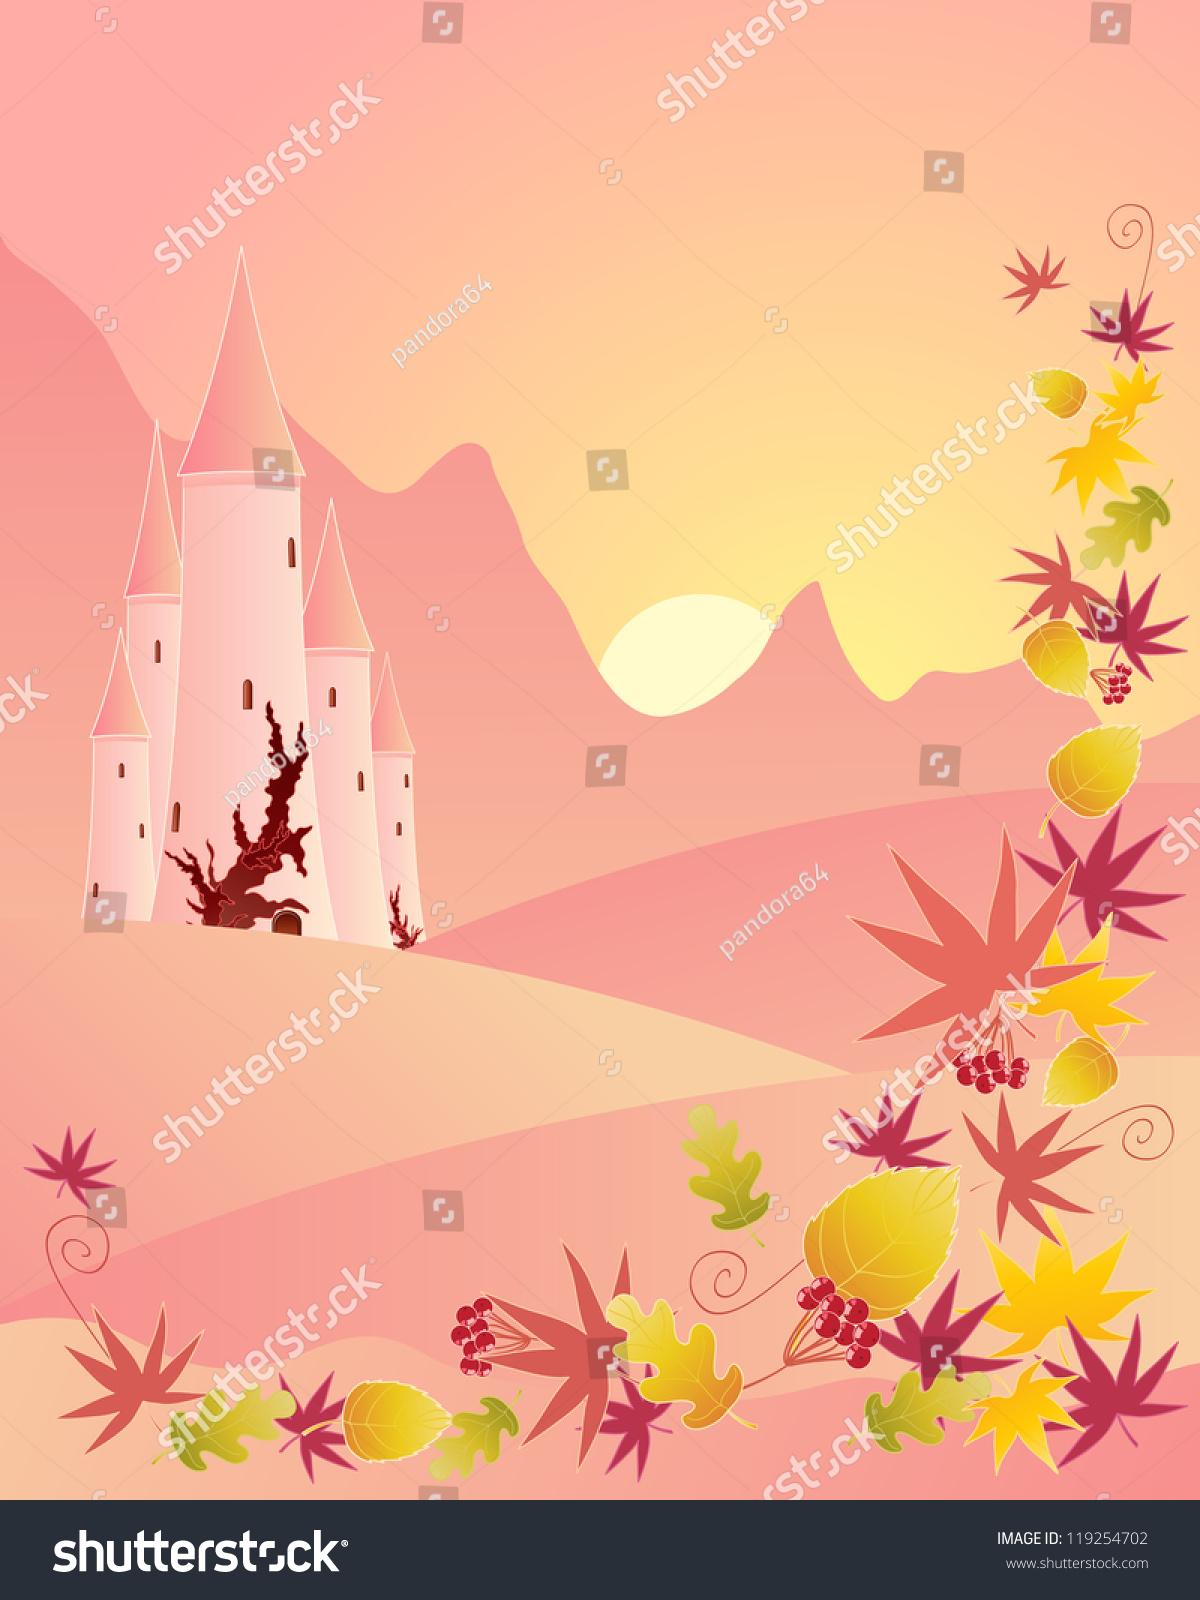 Royalty Free Stock Illustration Of Illustration Fairytale Castle